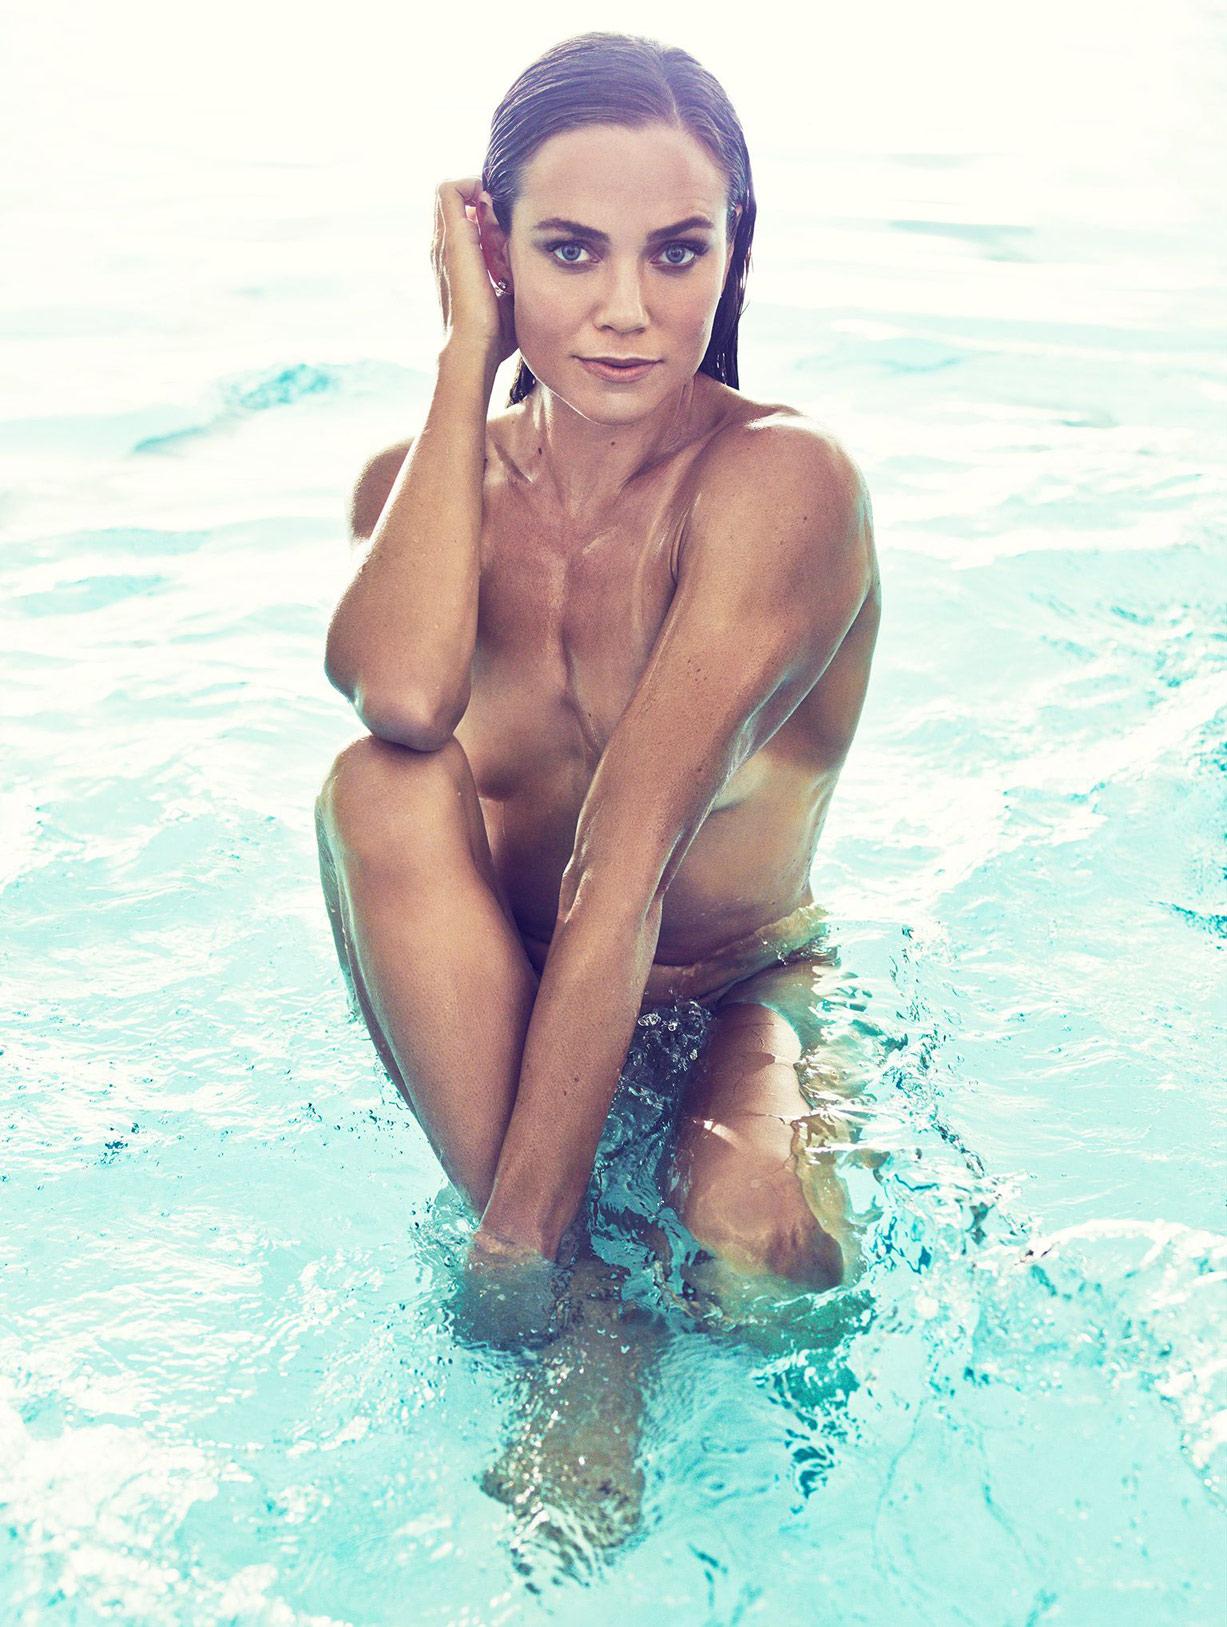 ESPN Magazine The Body Issue 2015 - Natalie Coughlin / Натали Коглин - Культ тела журнала ESPN